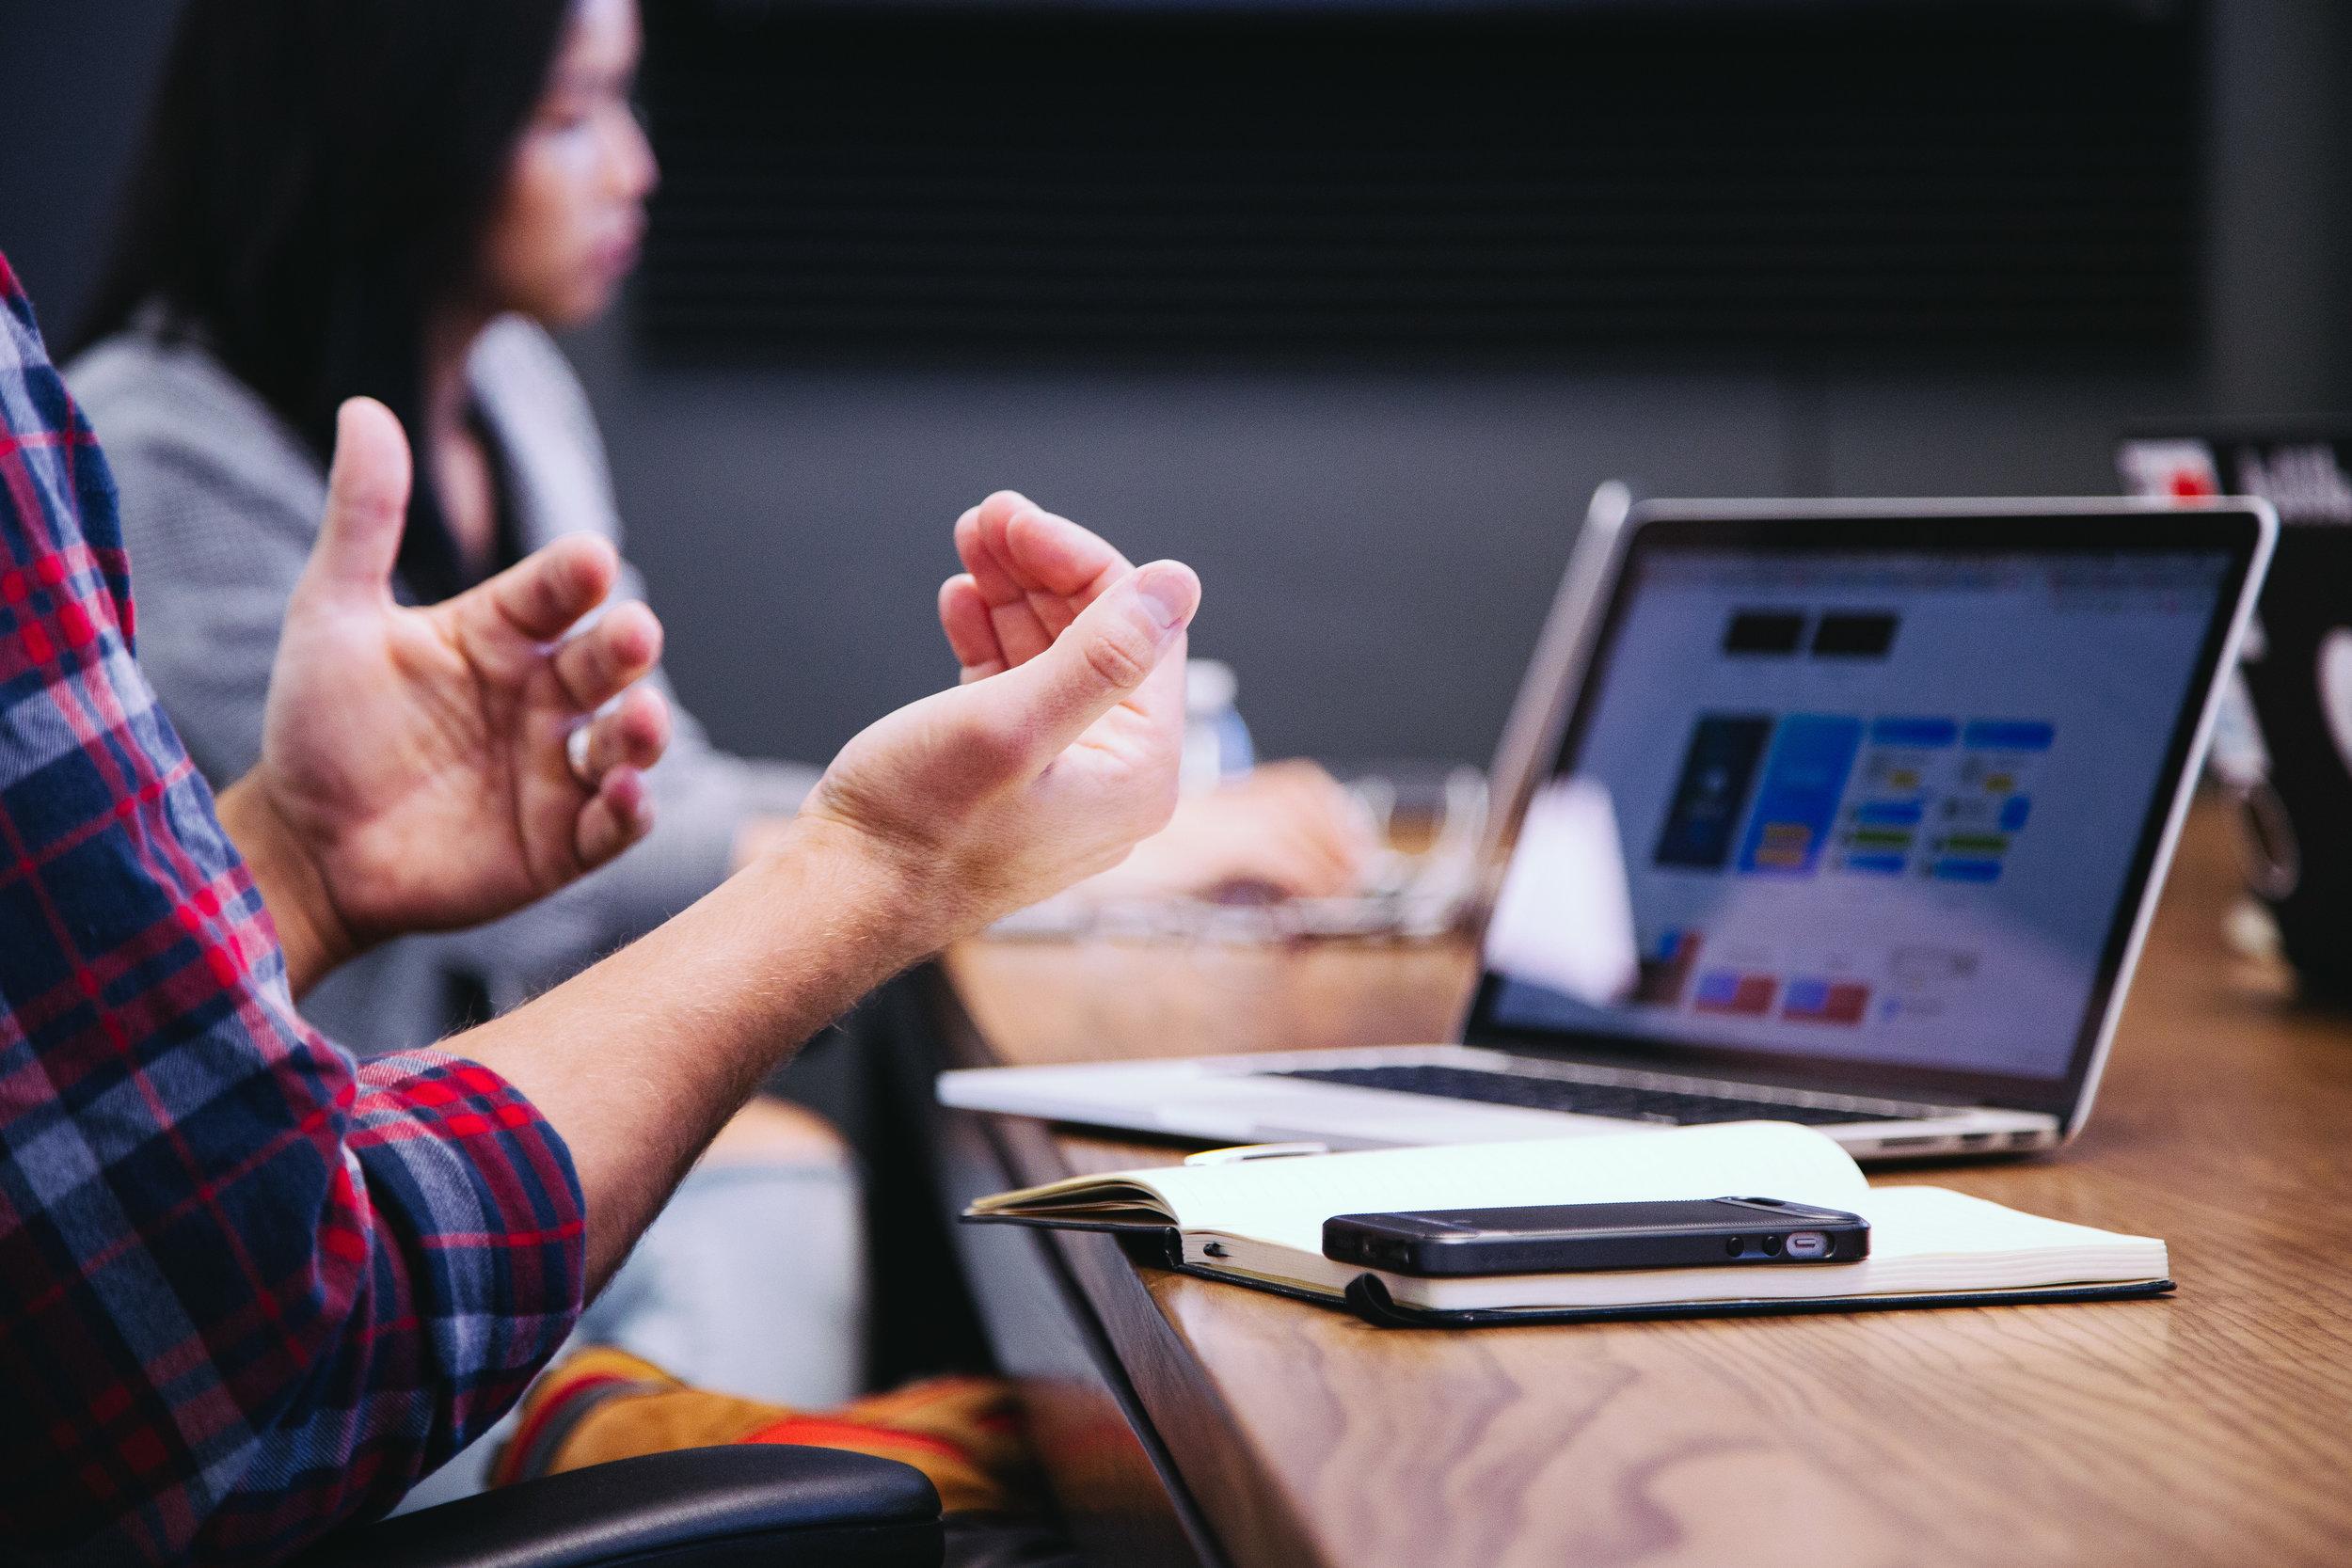 TABELLAE - INCREASING EFFICIENCY WITH ORGANIZED WORKFLOWS